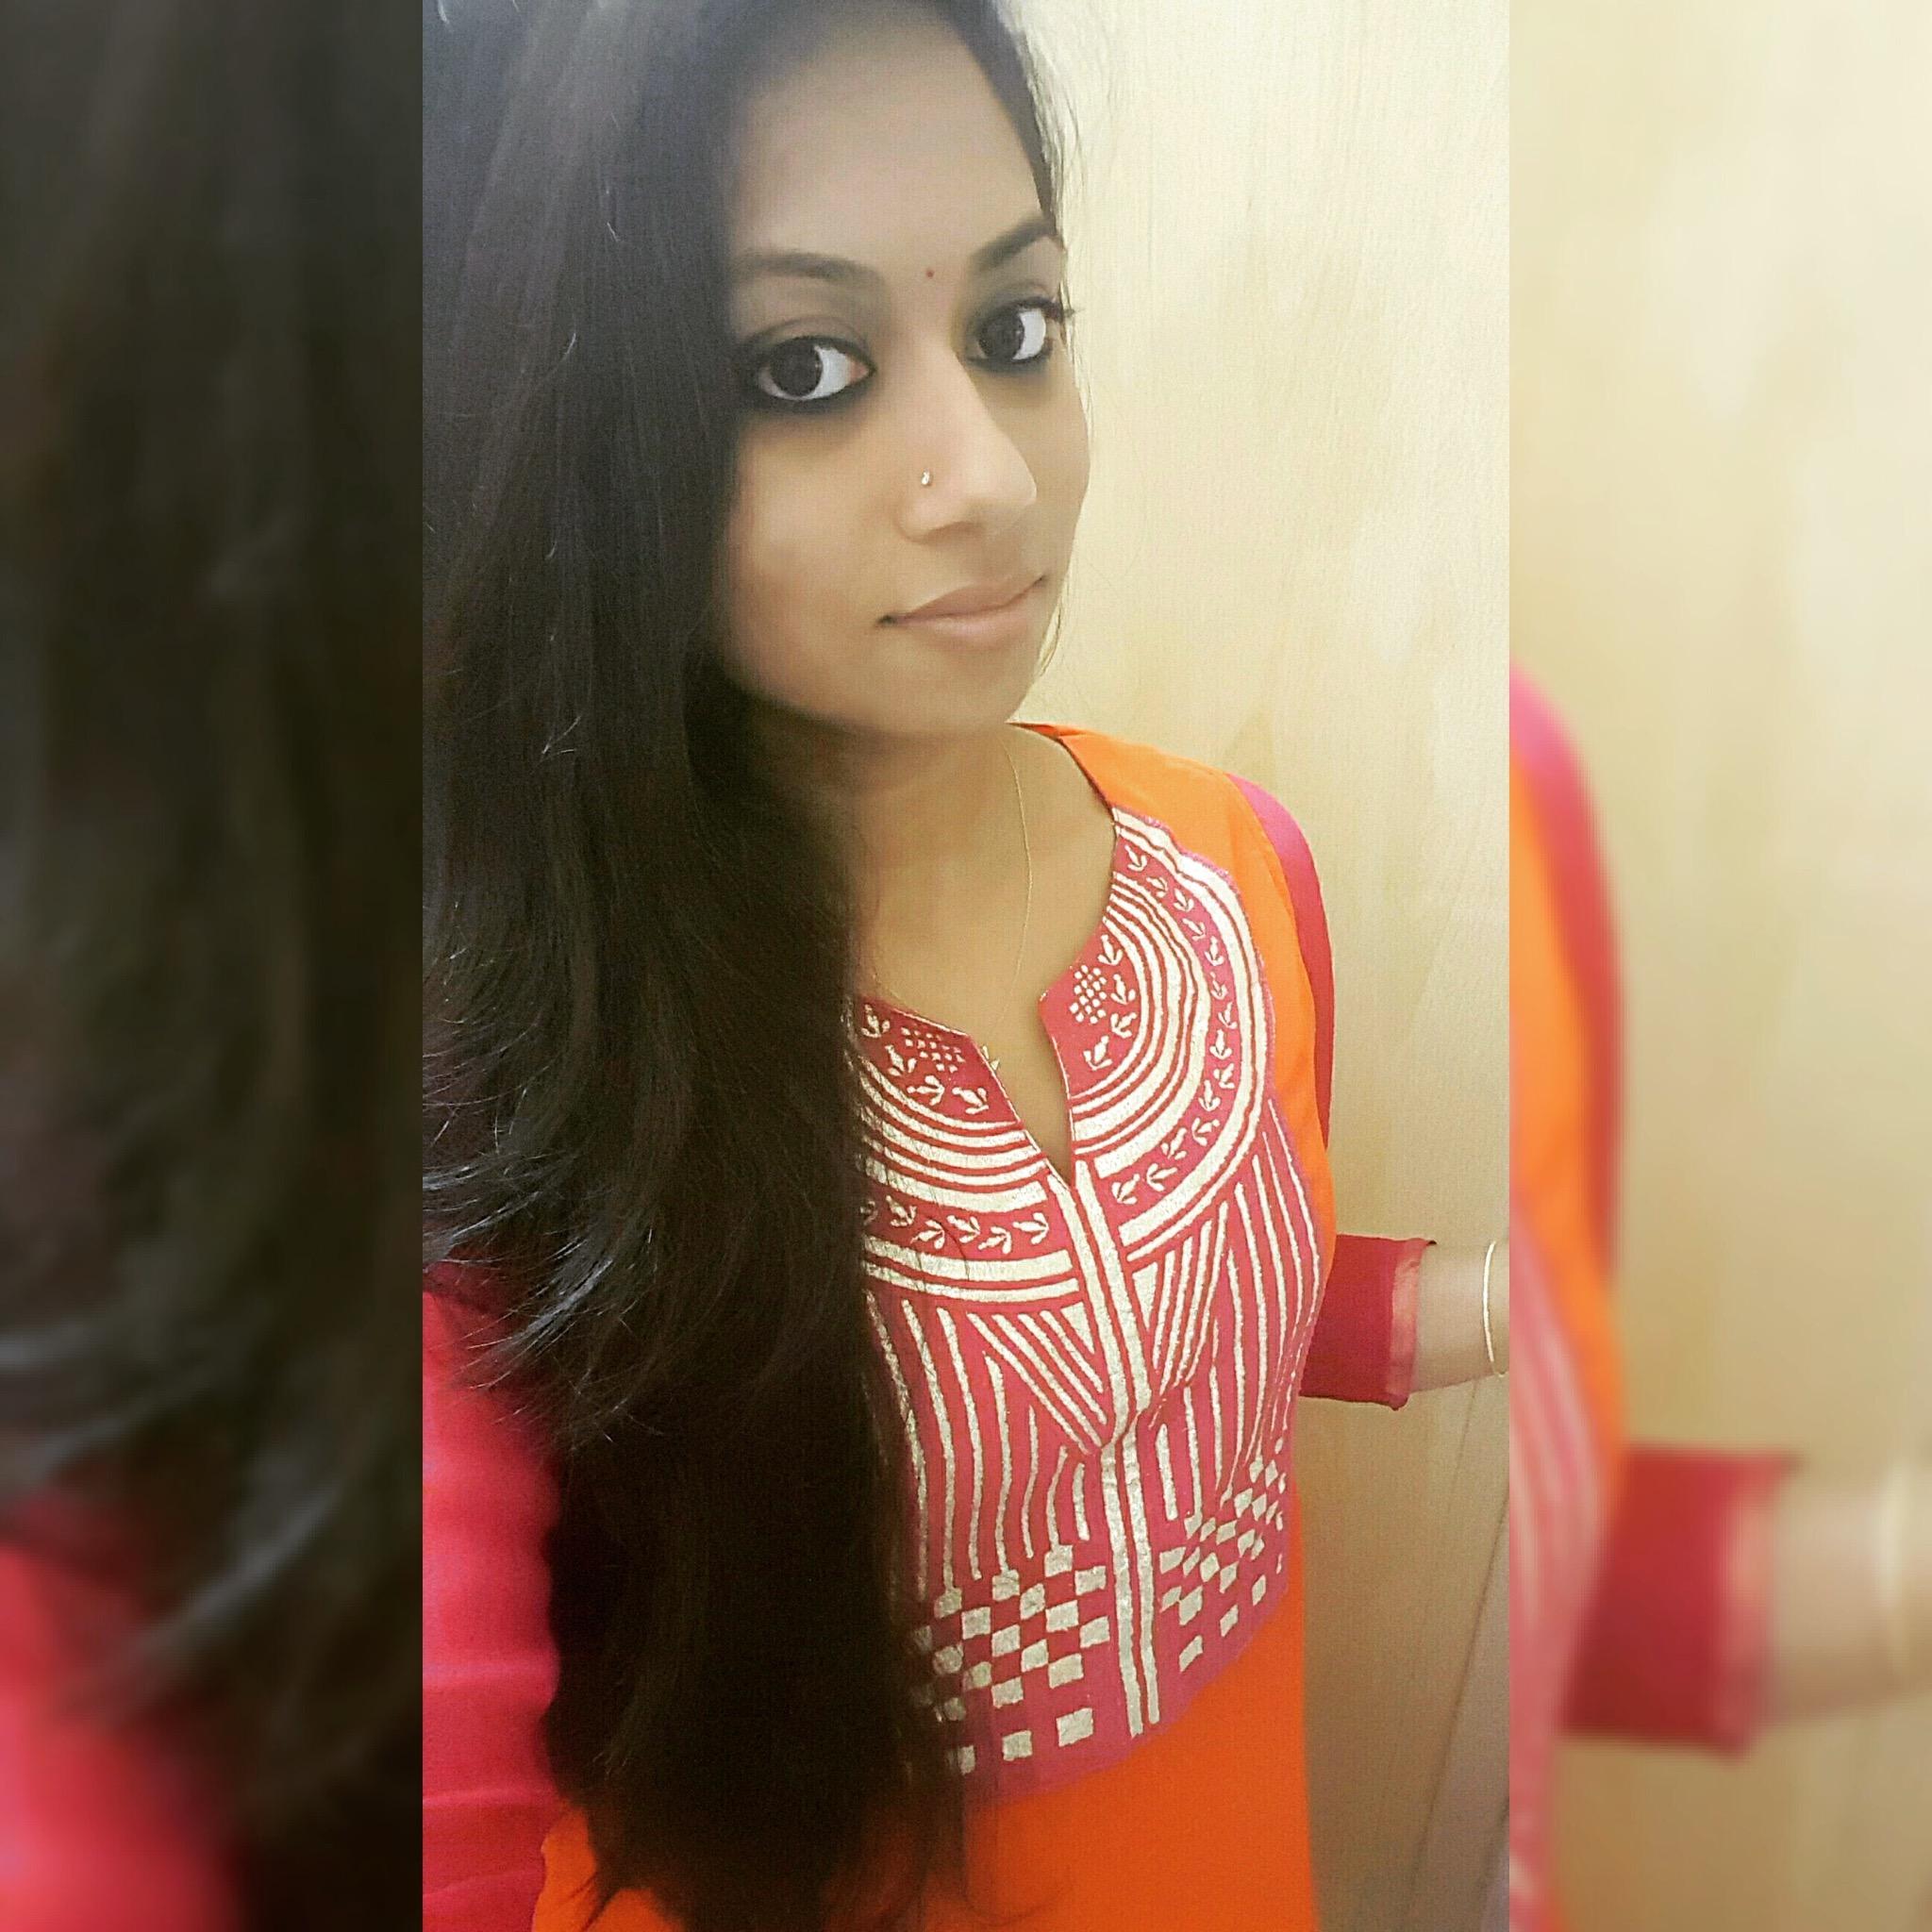 Sheetal Radhakrishnan (Uthrattathy) 9847 546153